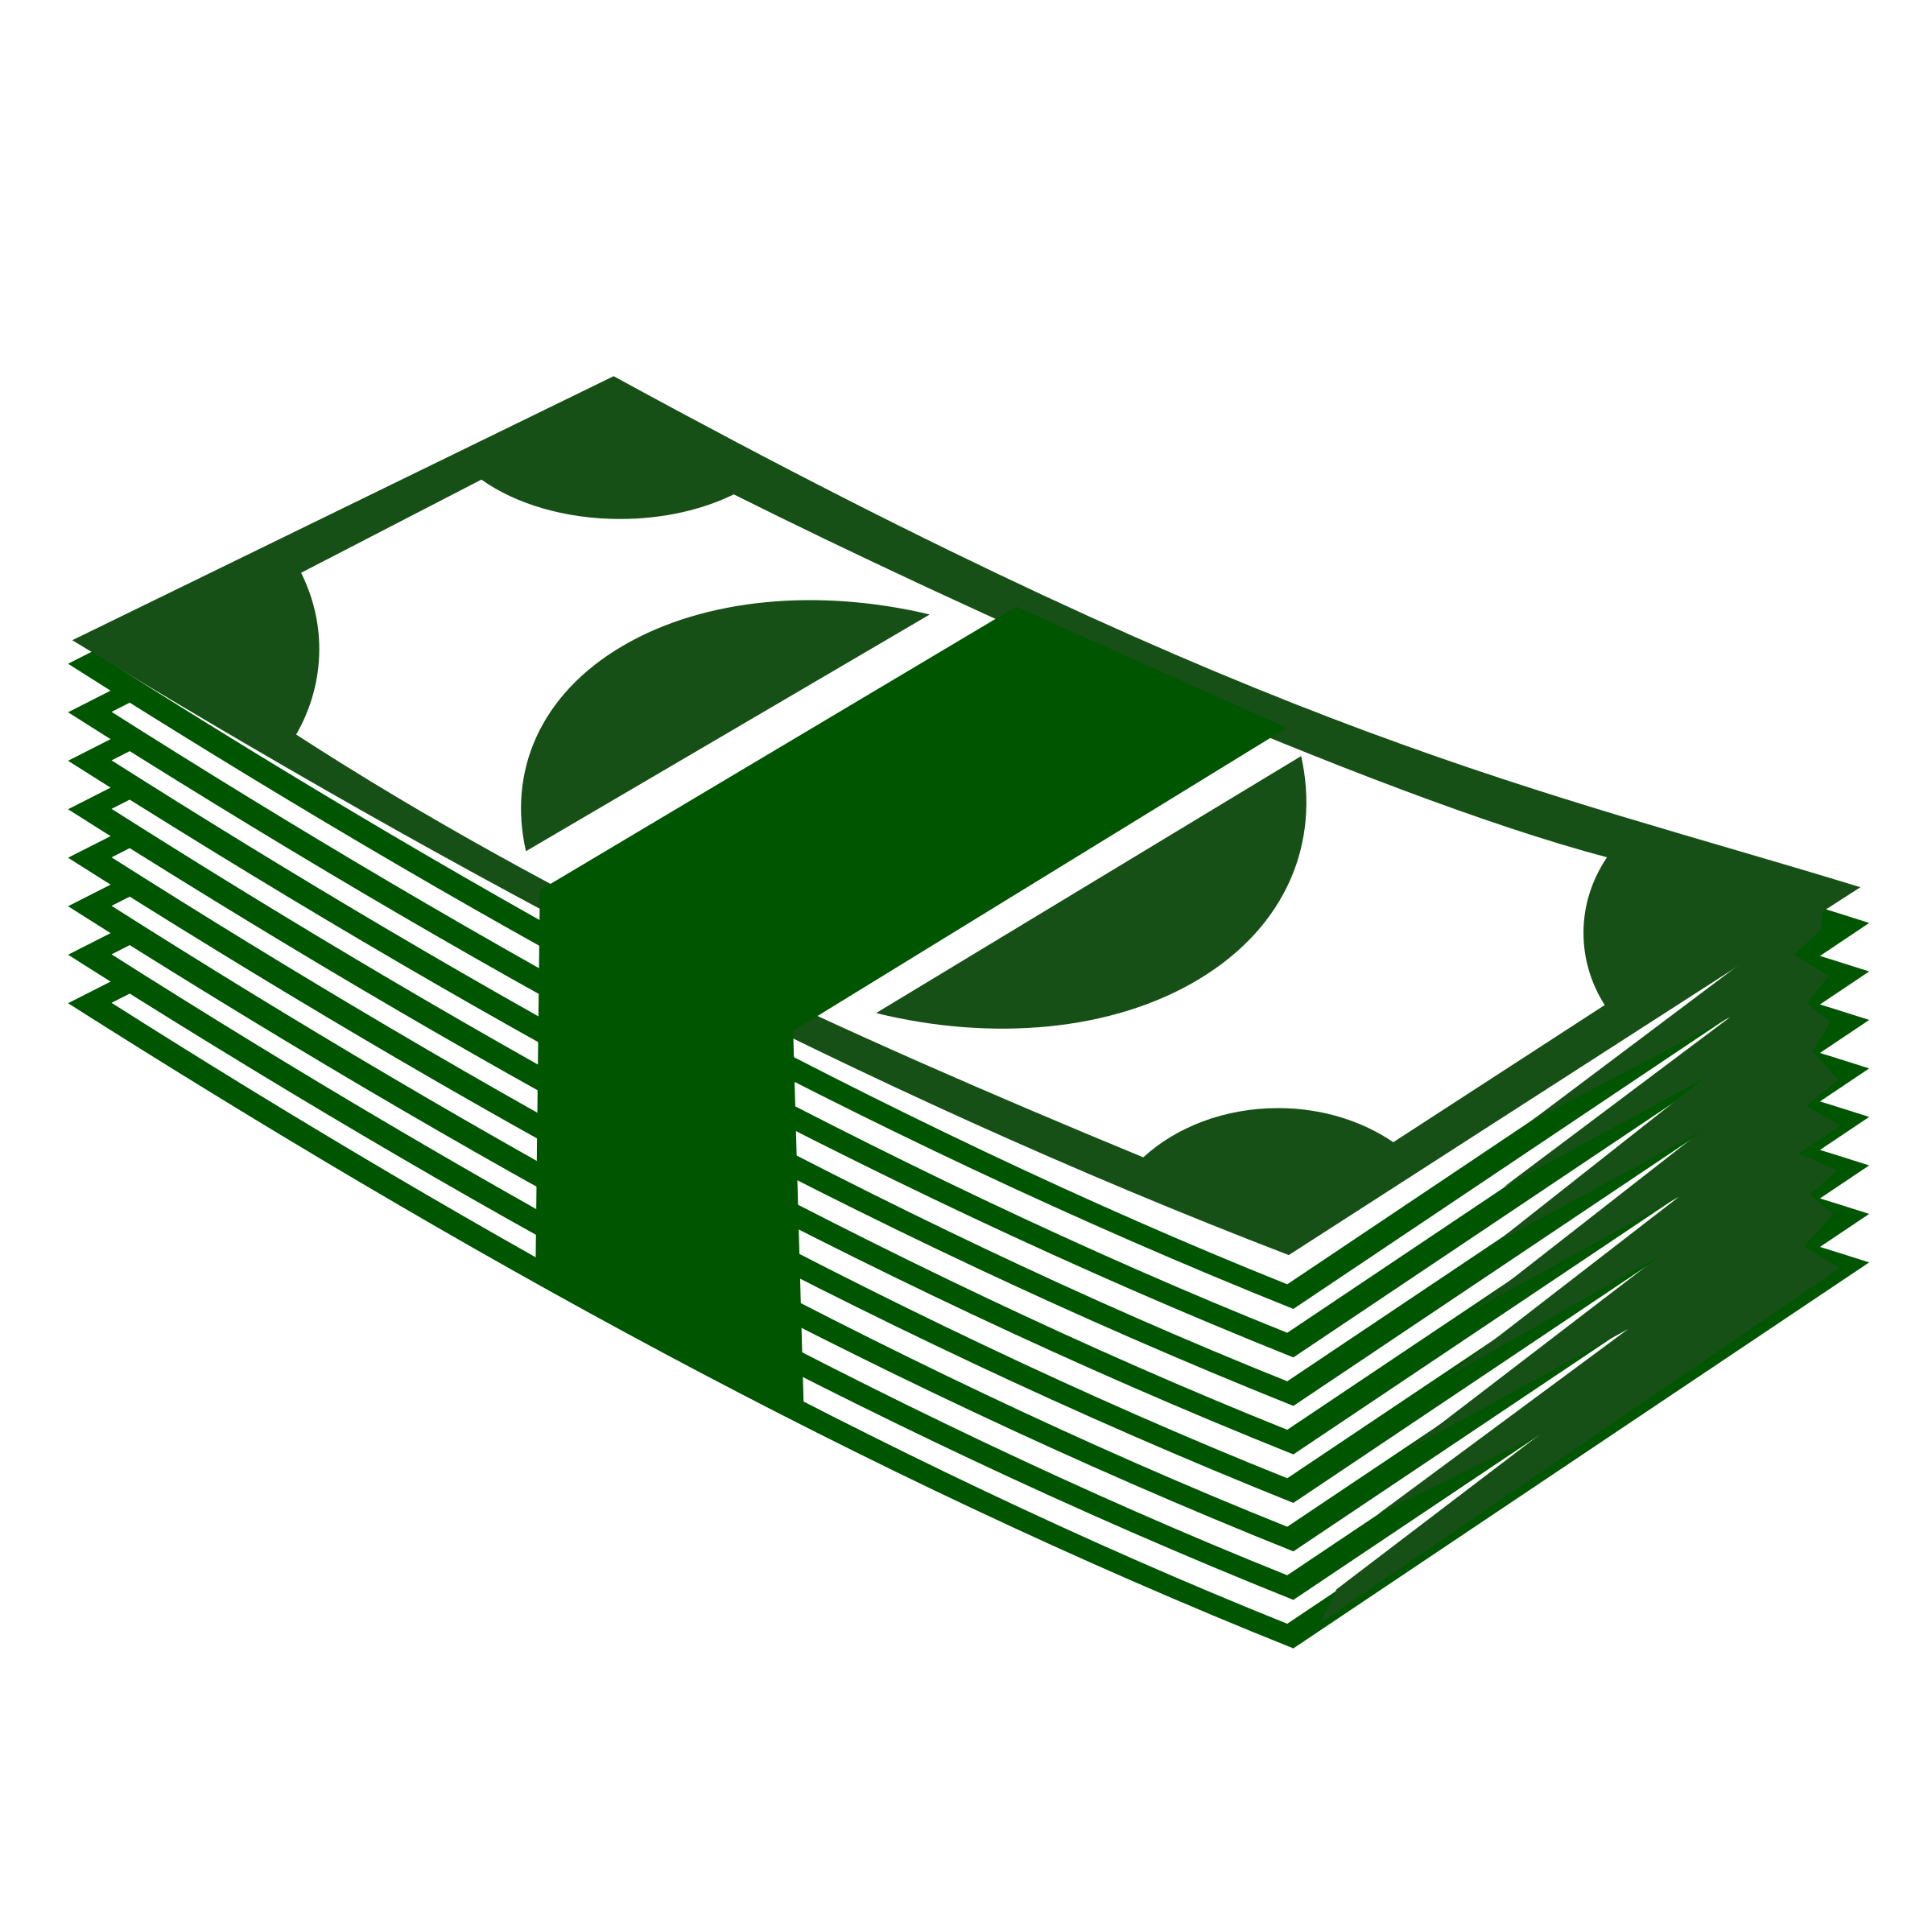 money clip art free printable clipart panda free clipart images rh clipartpanda com clip art of money bills clipart of money falling out of pocket